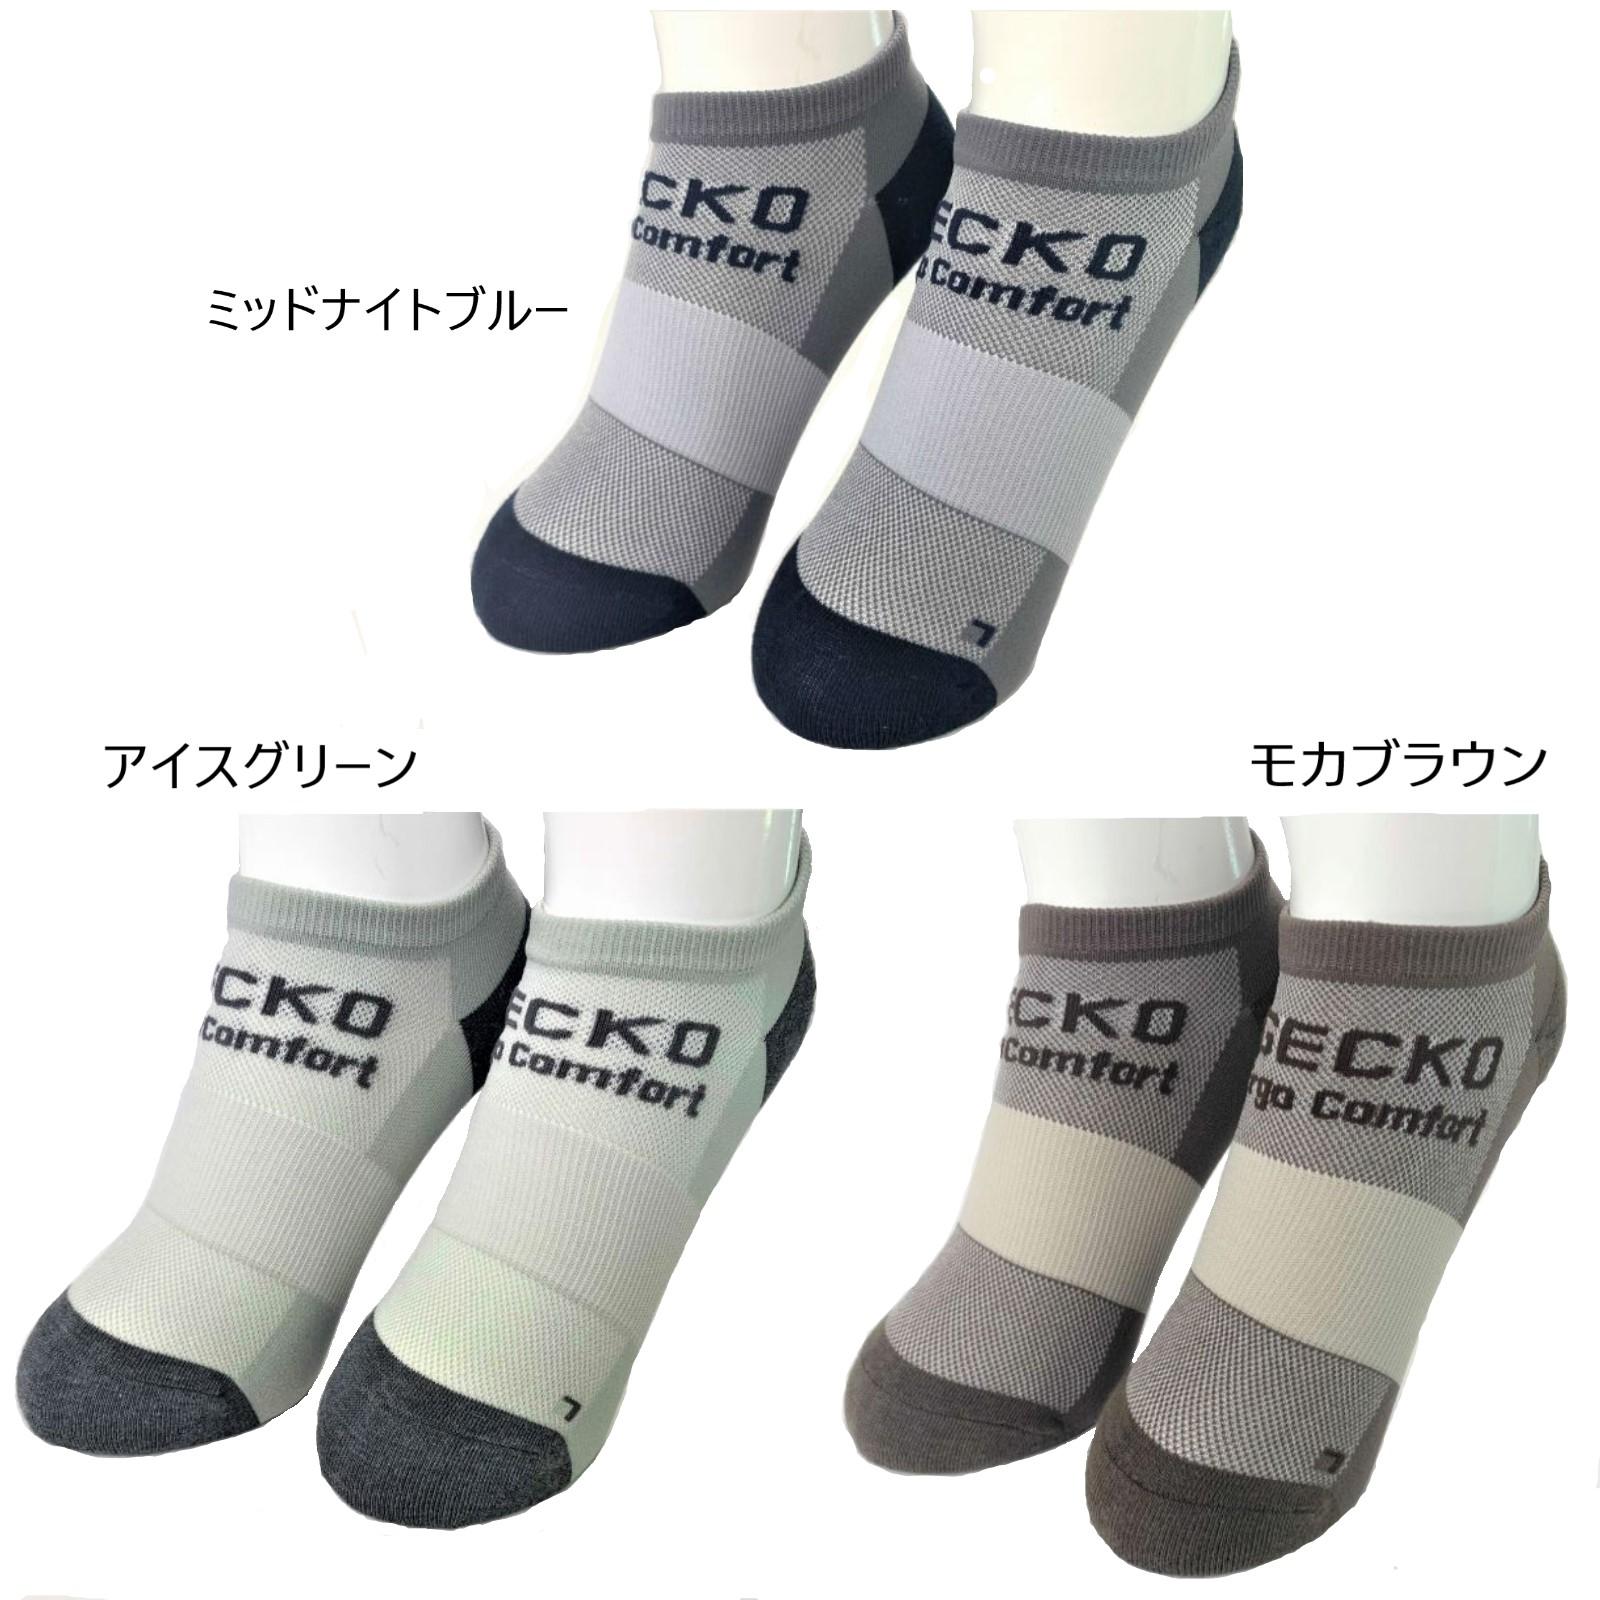 GECKO Ergo Comfort Tones ボルダリングソックス